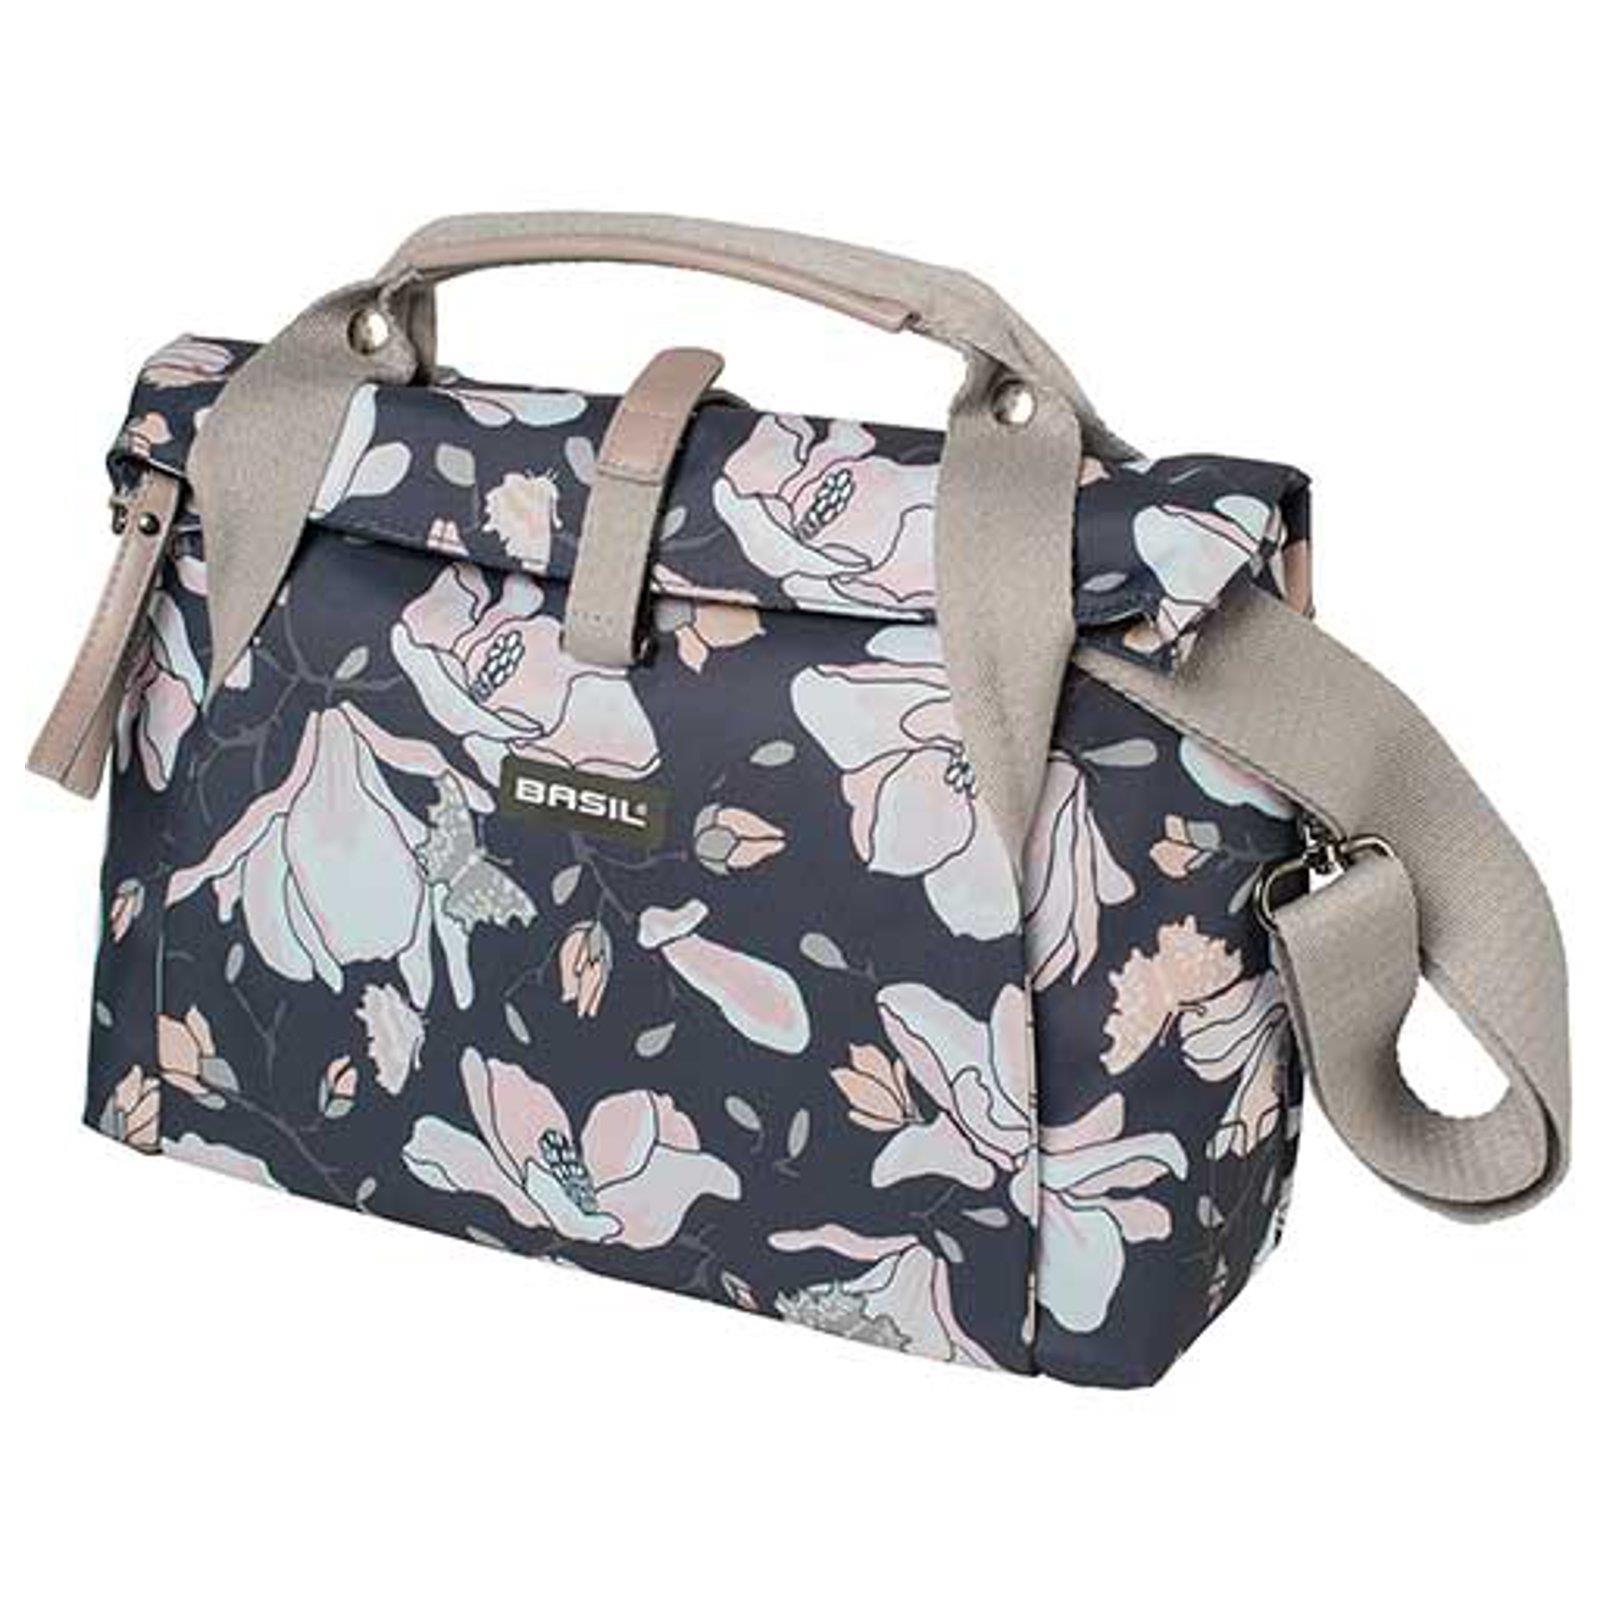 basil tasche city bag doppel packtasche fahrrad shopper carry magnolia blumen ebay. Black Bedroom Furniture Sets. Home Design Ideas